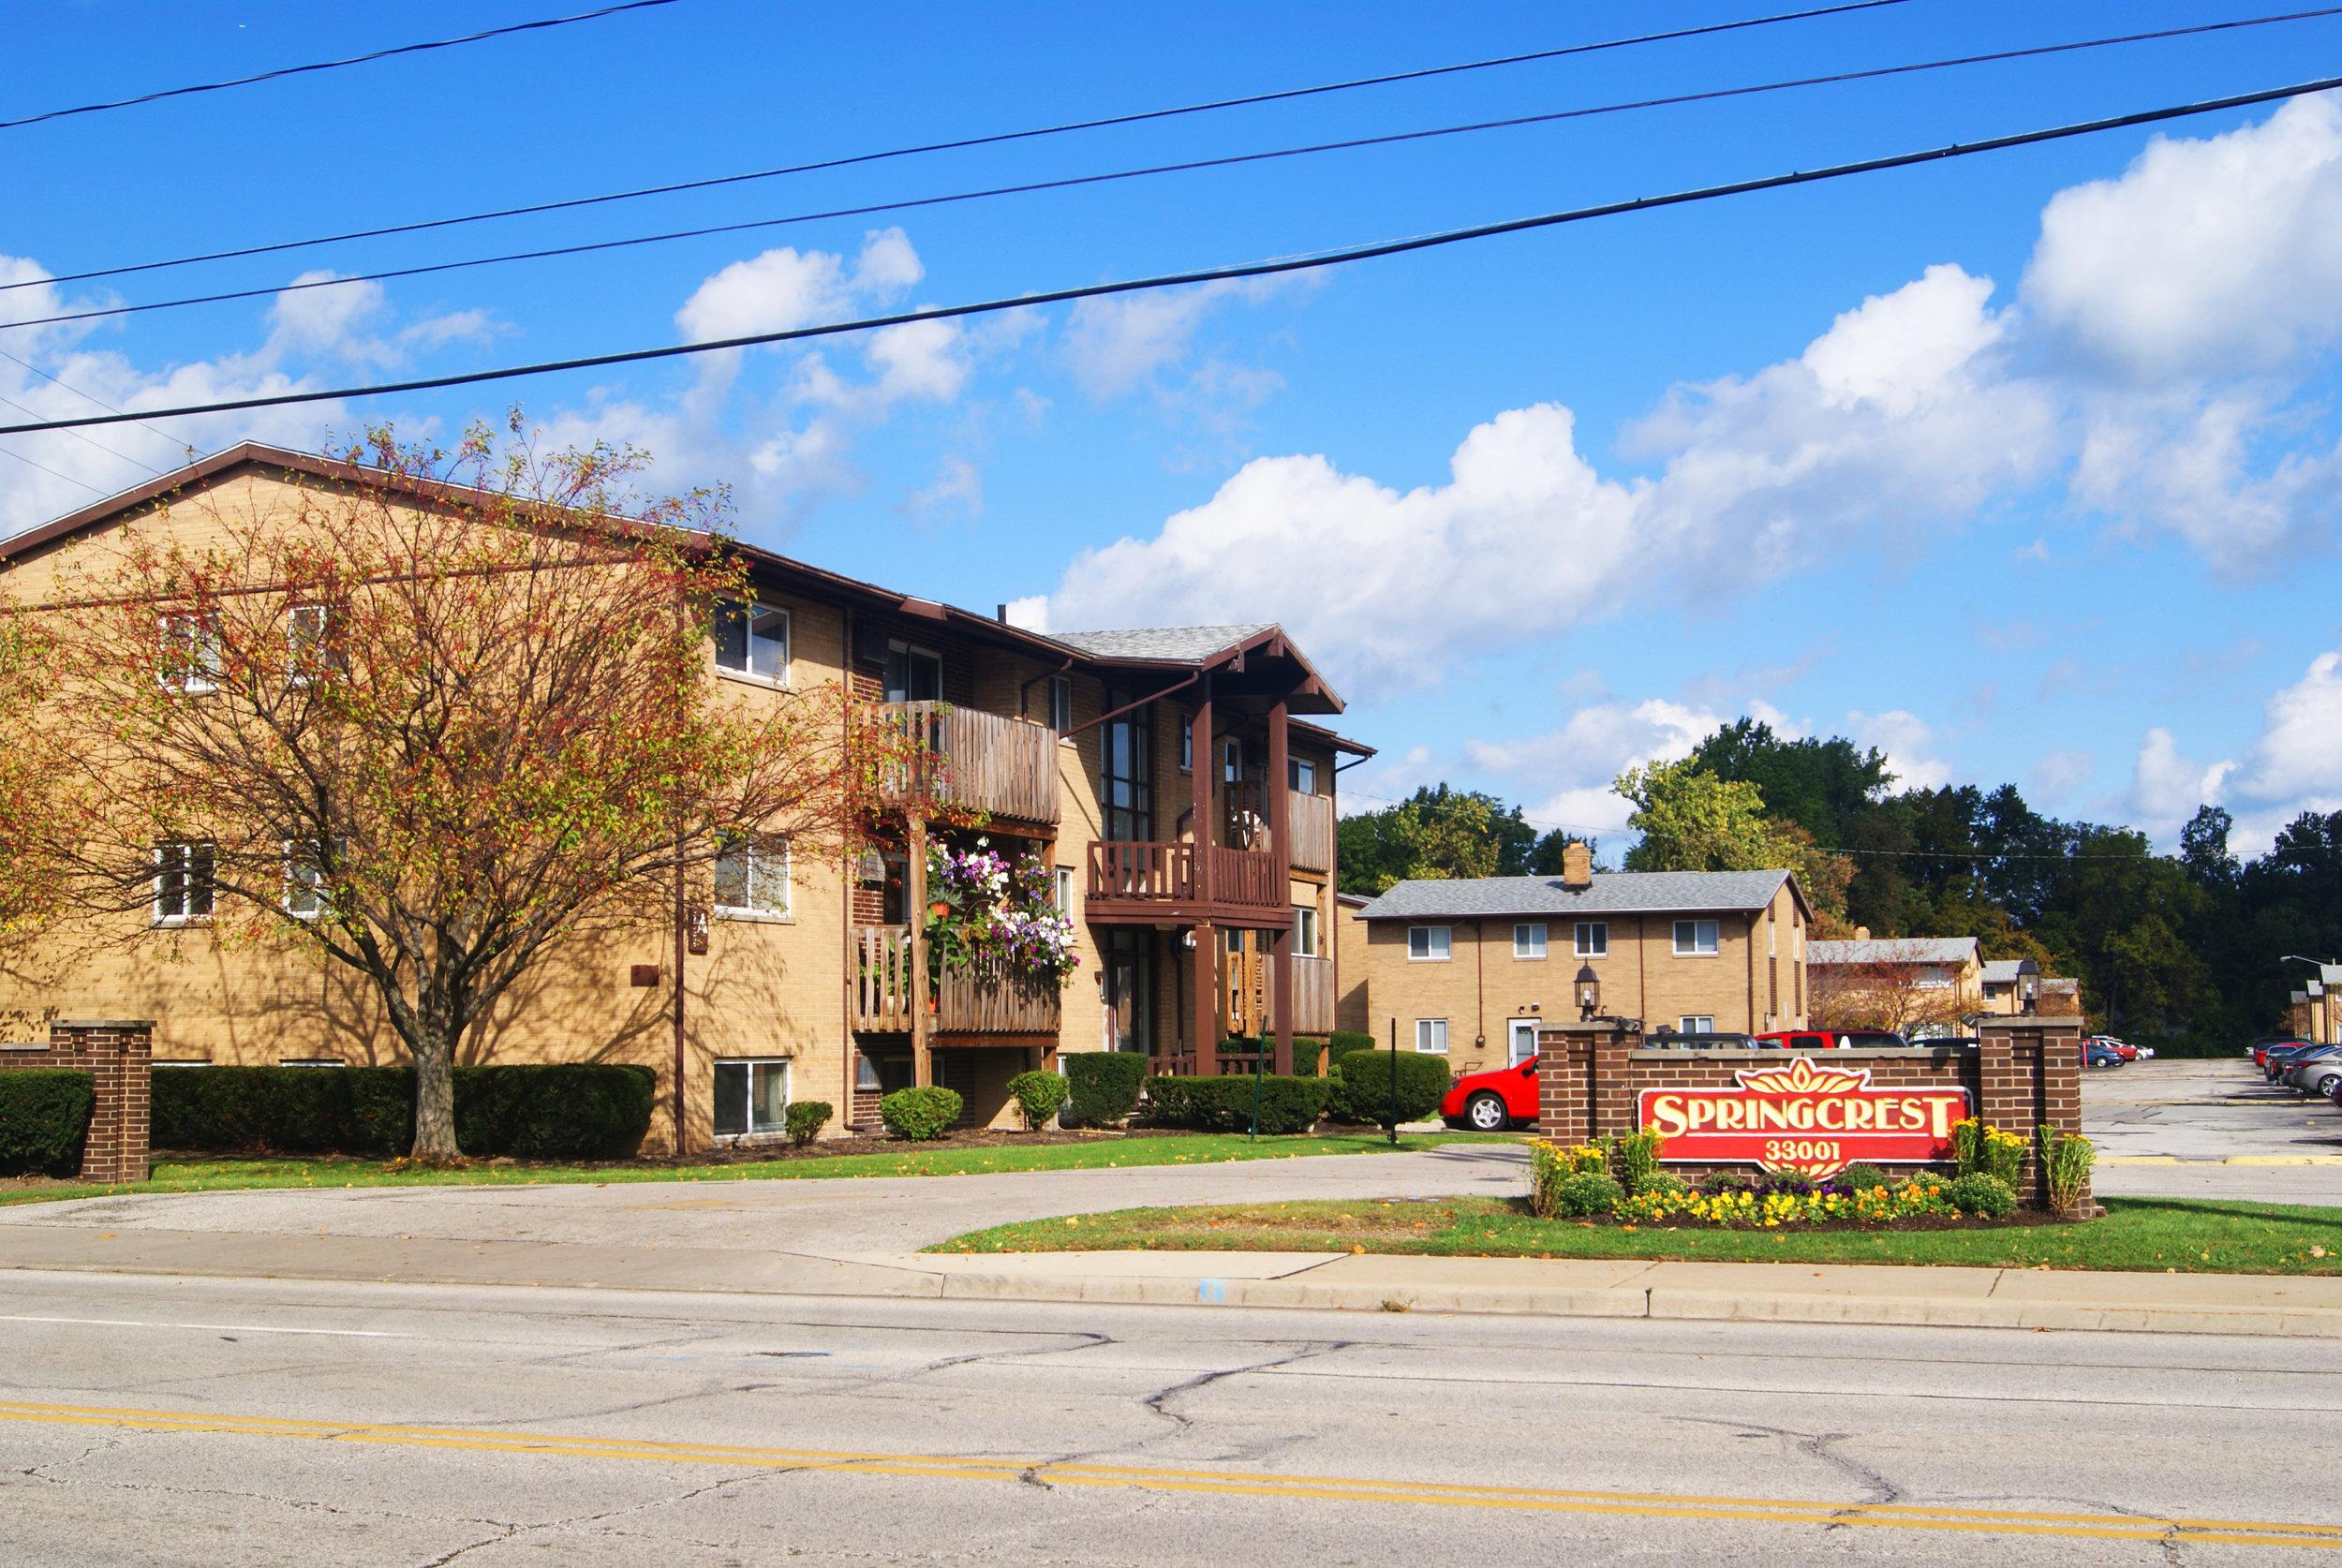 Springcrest Apartments - Willowick, Ohio